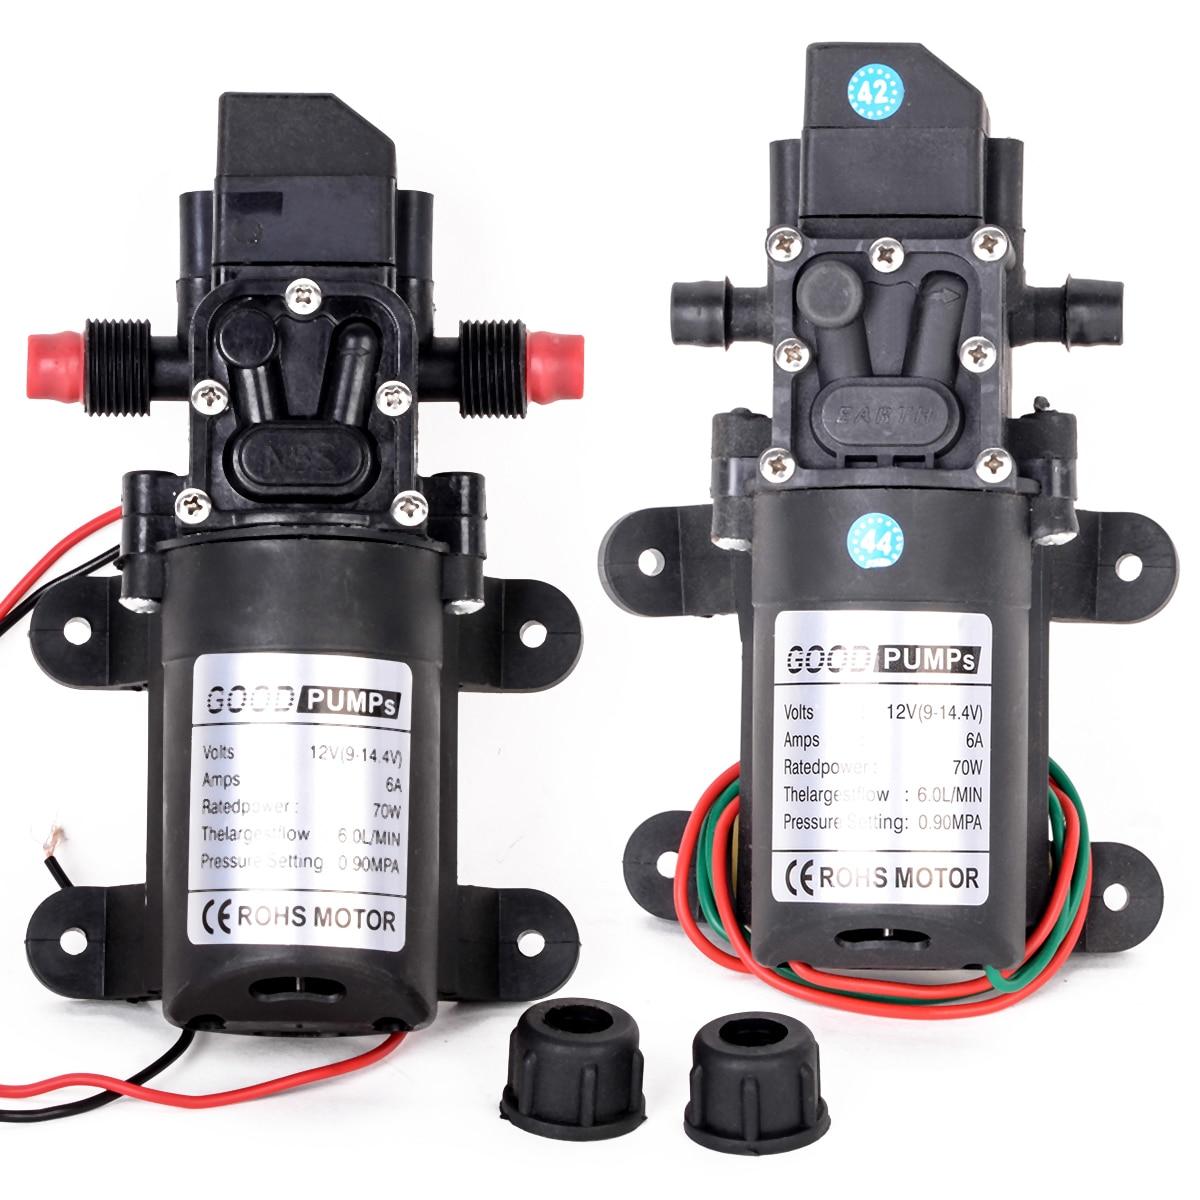 1pc High Quality DC12V 70W 130PSI Diaphragm Water Pump Small Safe High Pressure Self Priming Pump 6L/Min 165*100*62mm  Mayitr high quality 8l min 24v dc 80w food grade pump dc